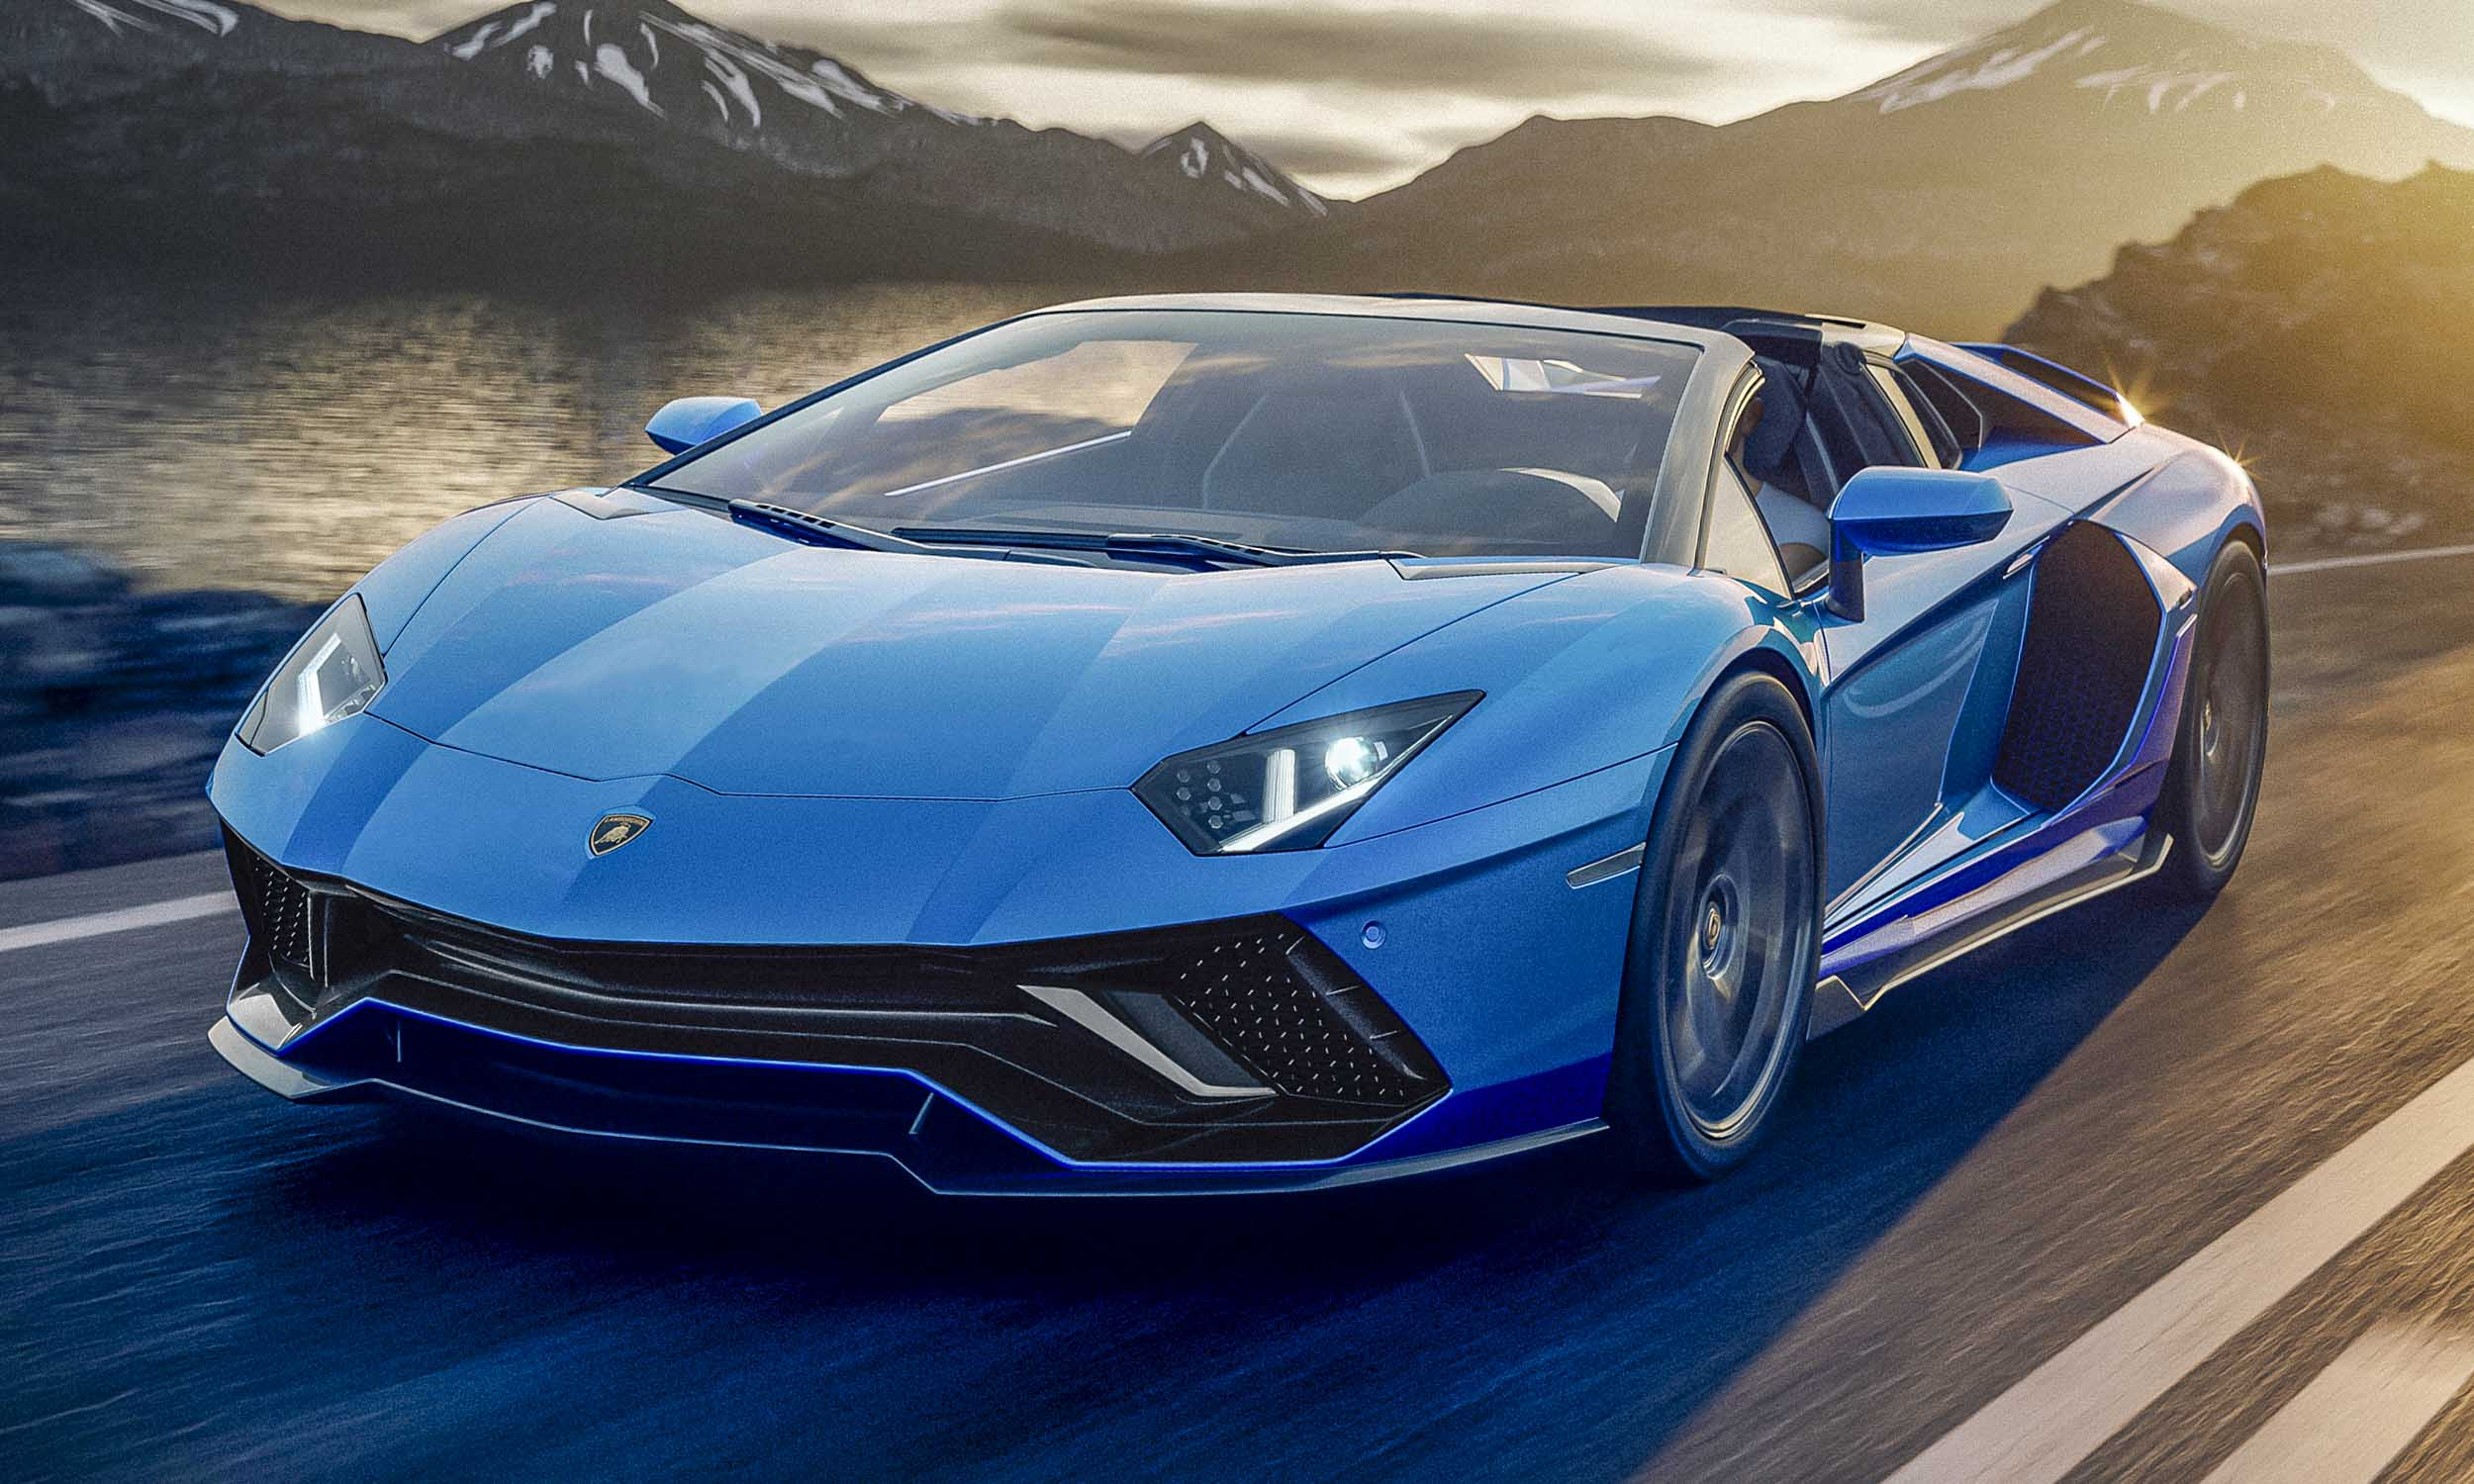 Lamborghini Aventador Ultimae — Last of the V12 Lambos?